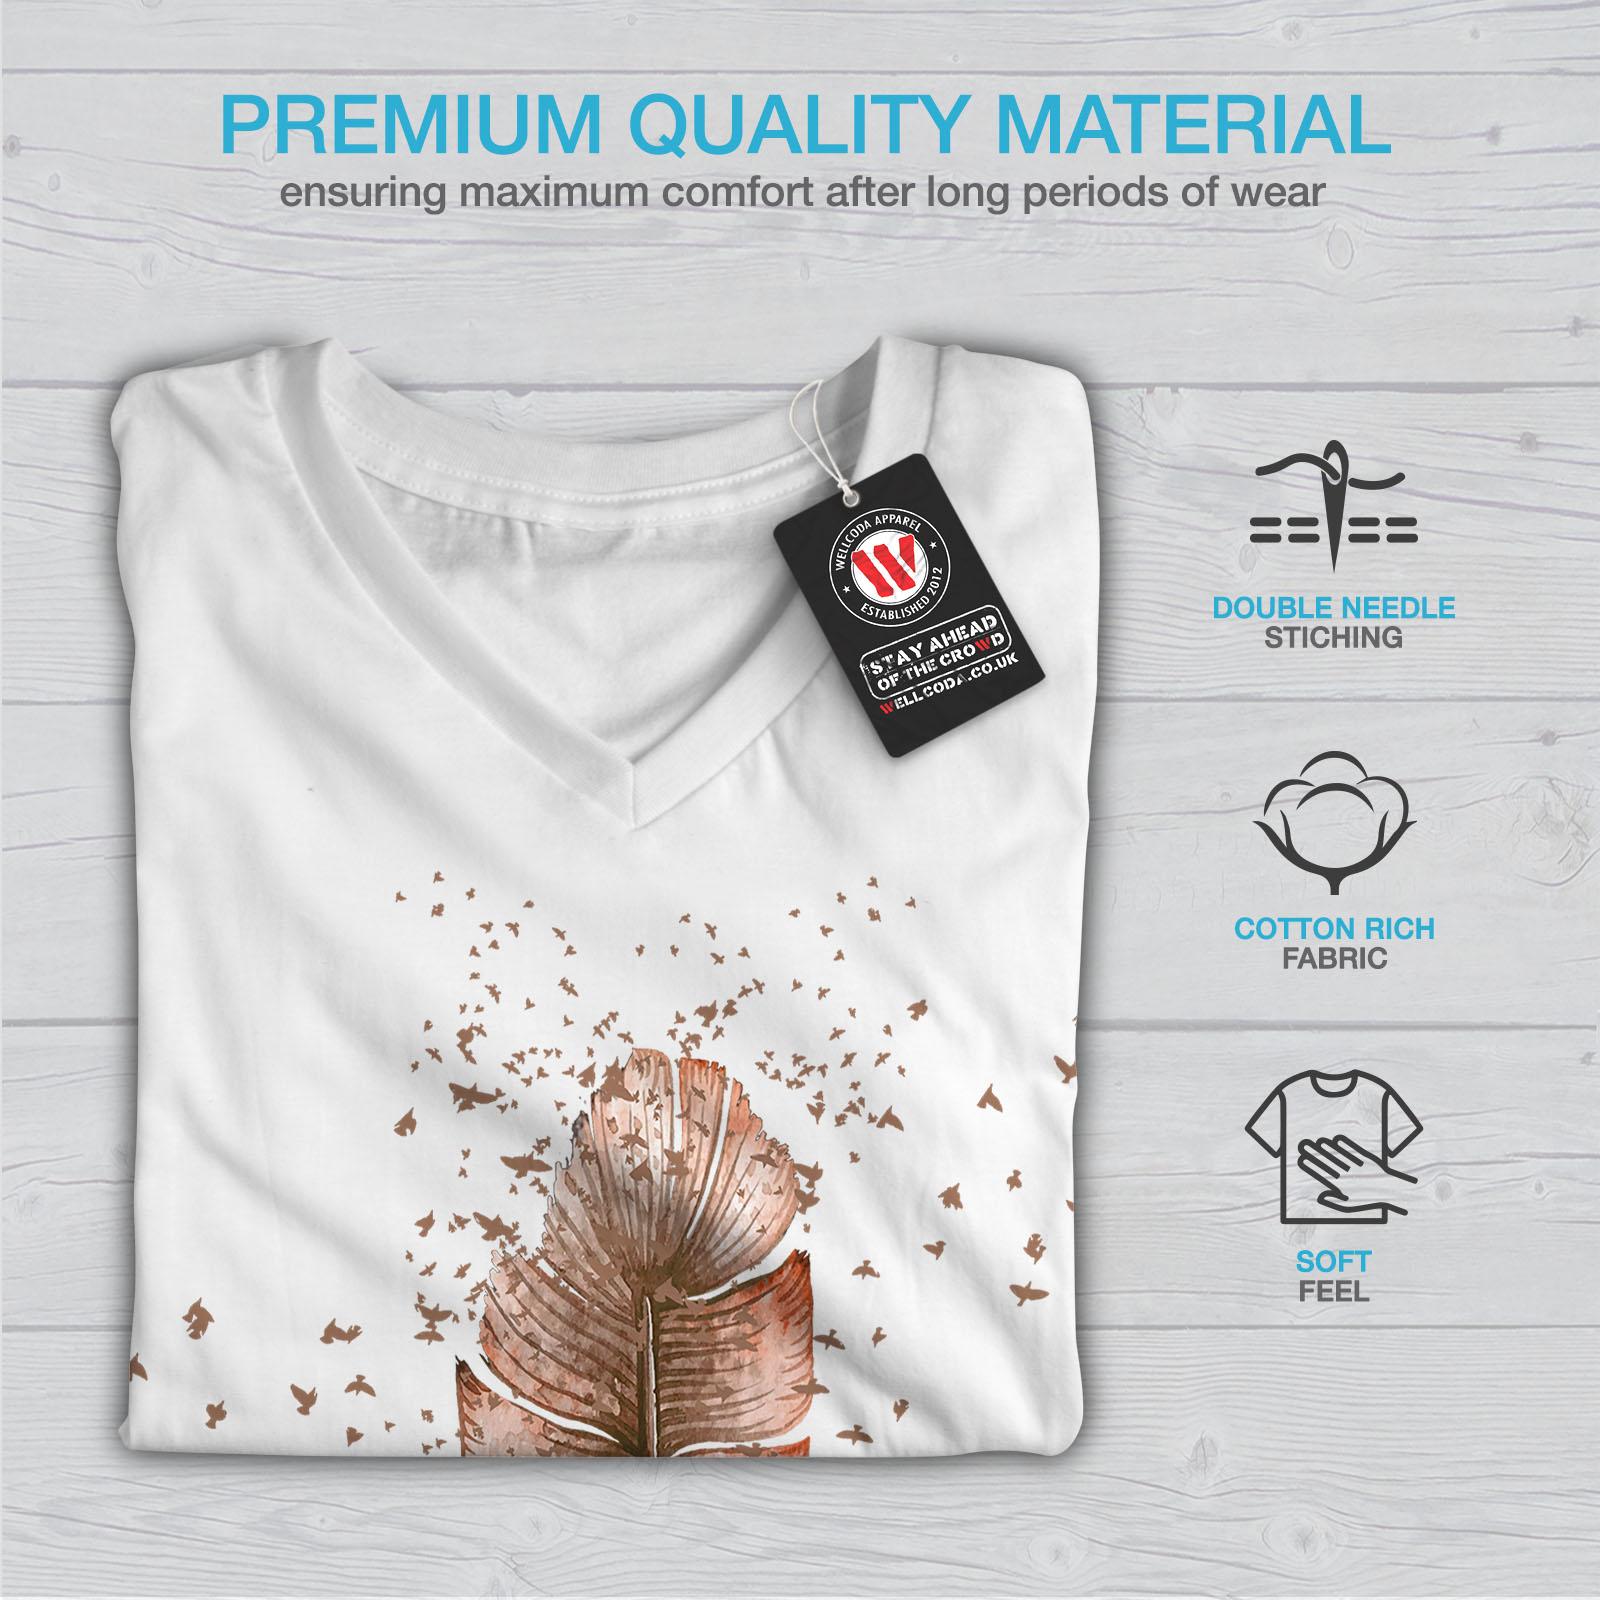 Wellcoda-Soft-Bird-Feather-Womens-V-Neck-T-shirt-Delicate-Graphic-Design-Tee thumbnail 9